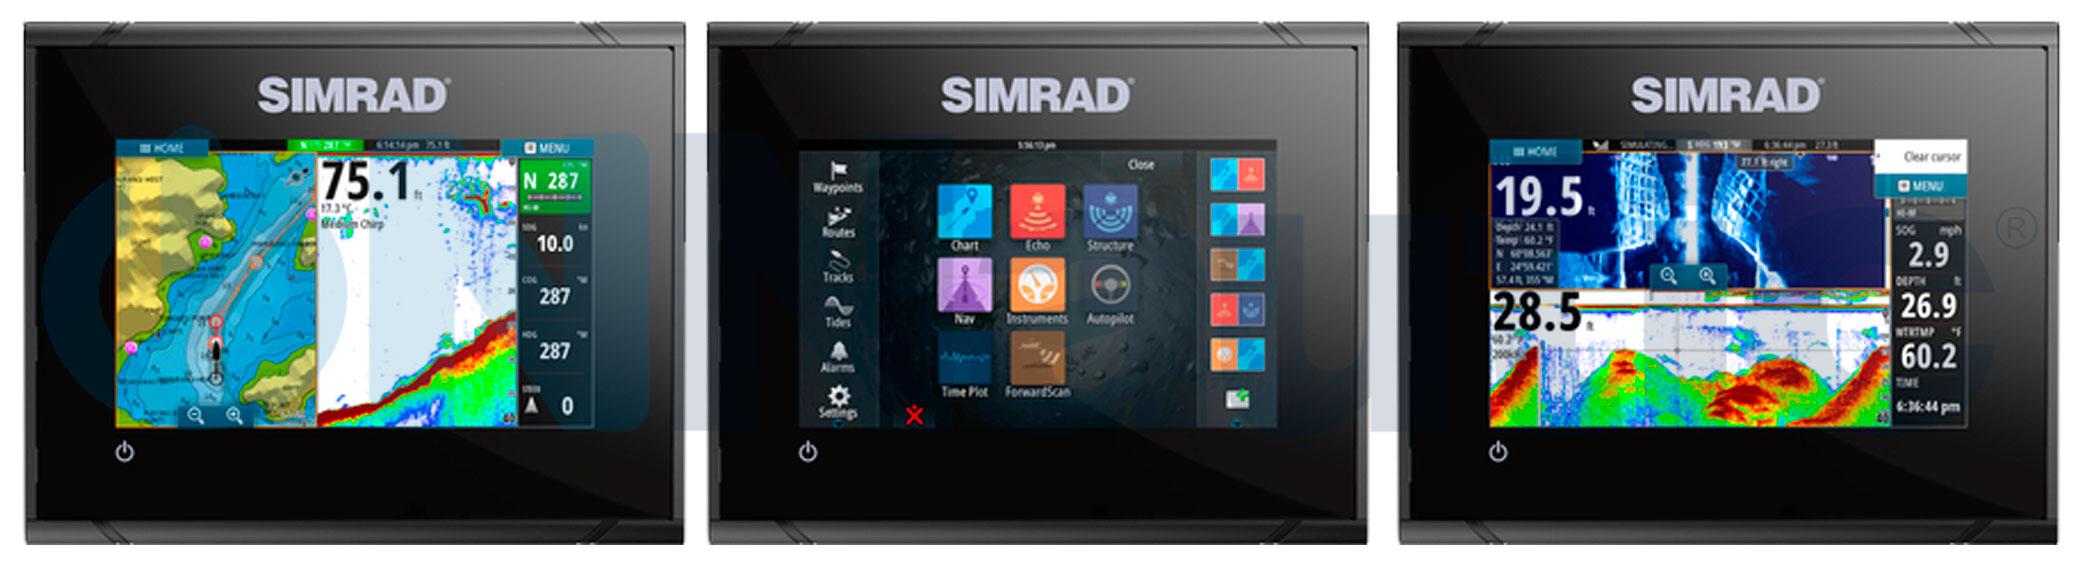 SIMRAD GO5